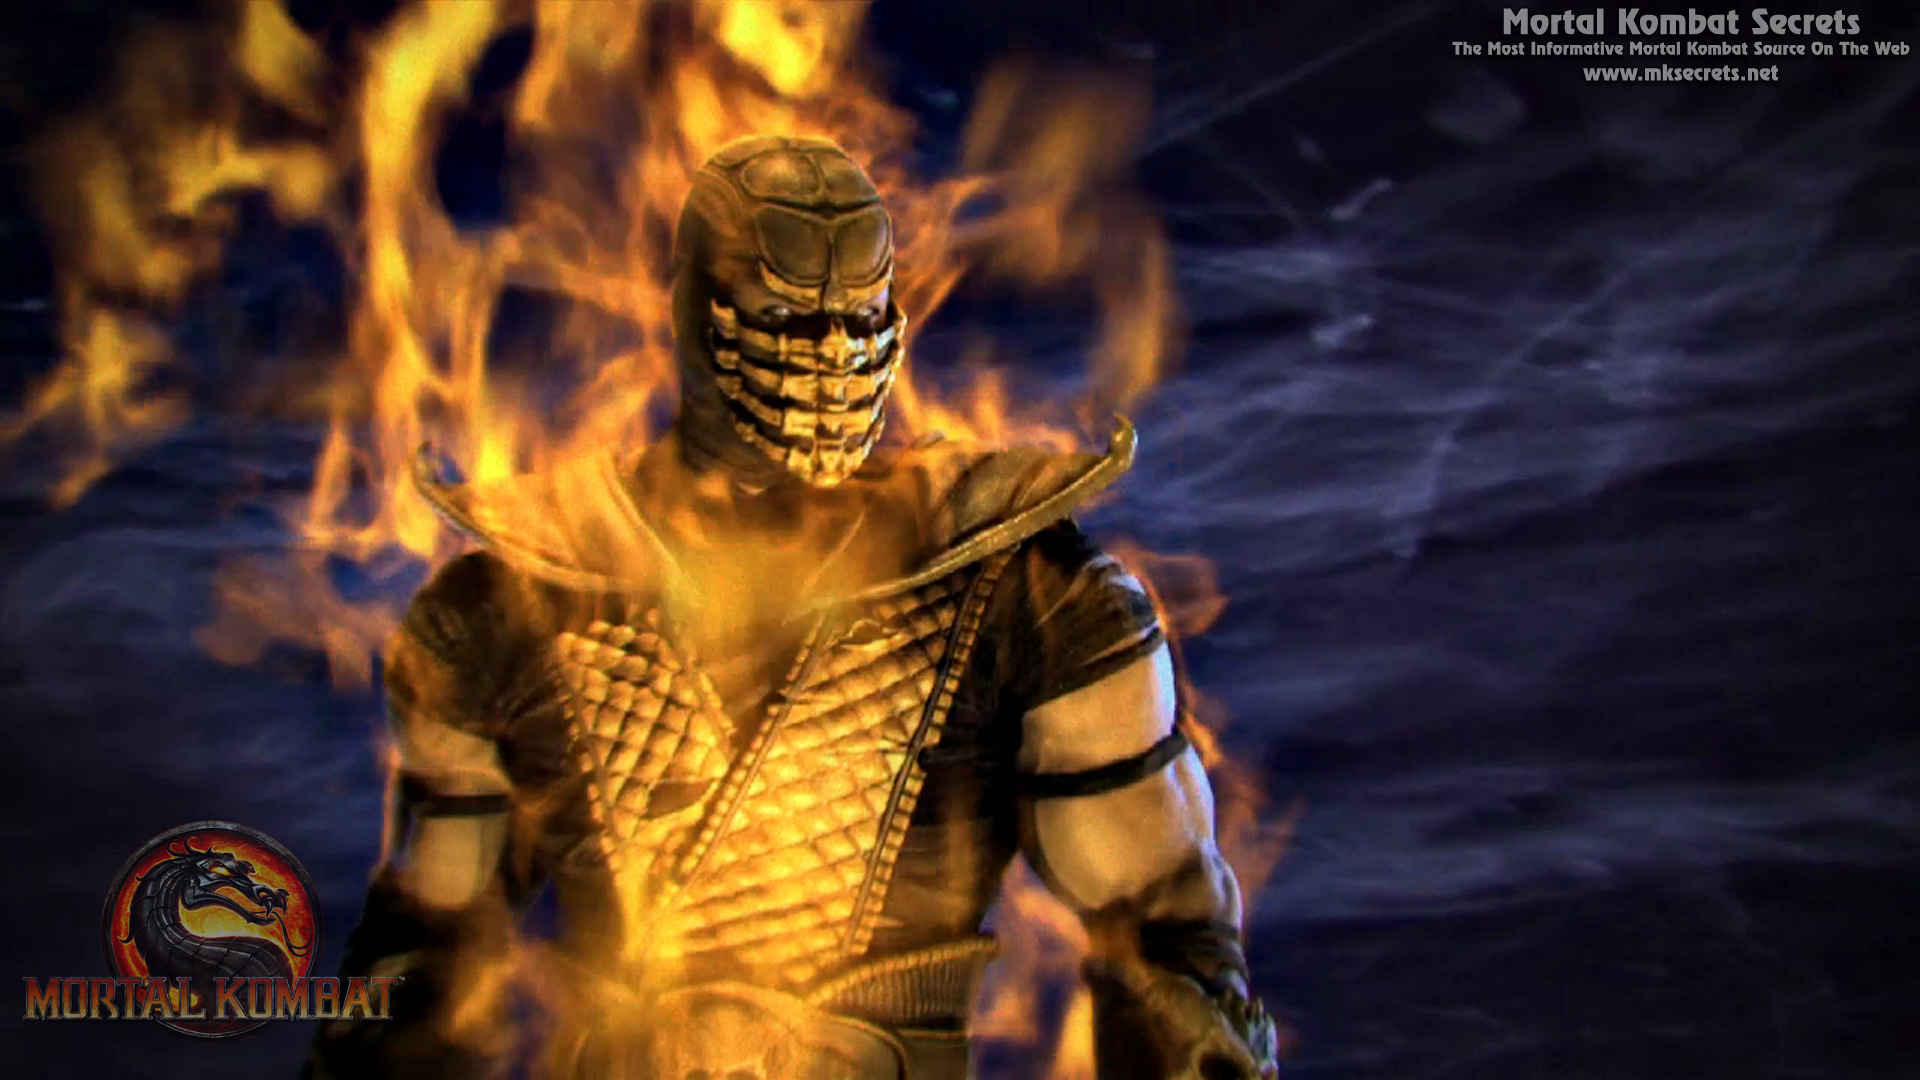 Mortal Kombat Scorpion Wallpaper 2012 mortal kombat 9 (2011 ...